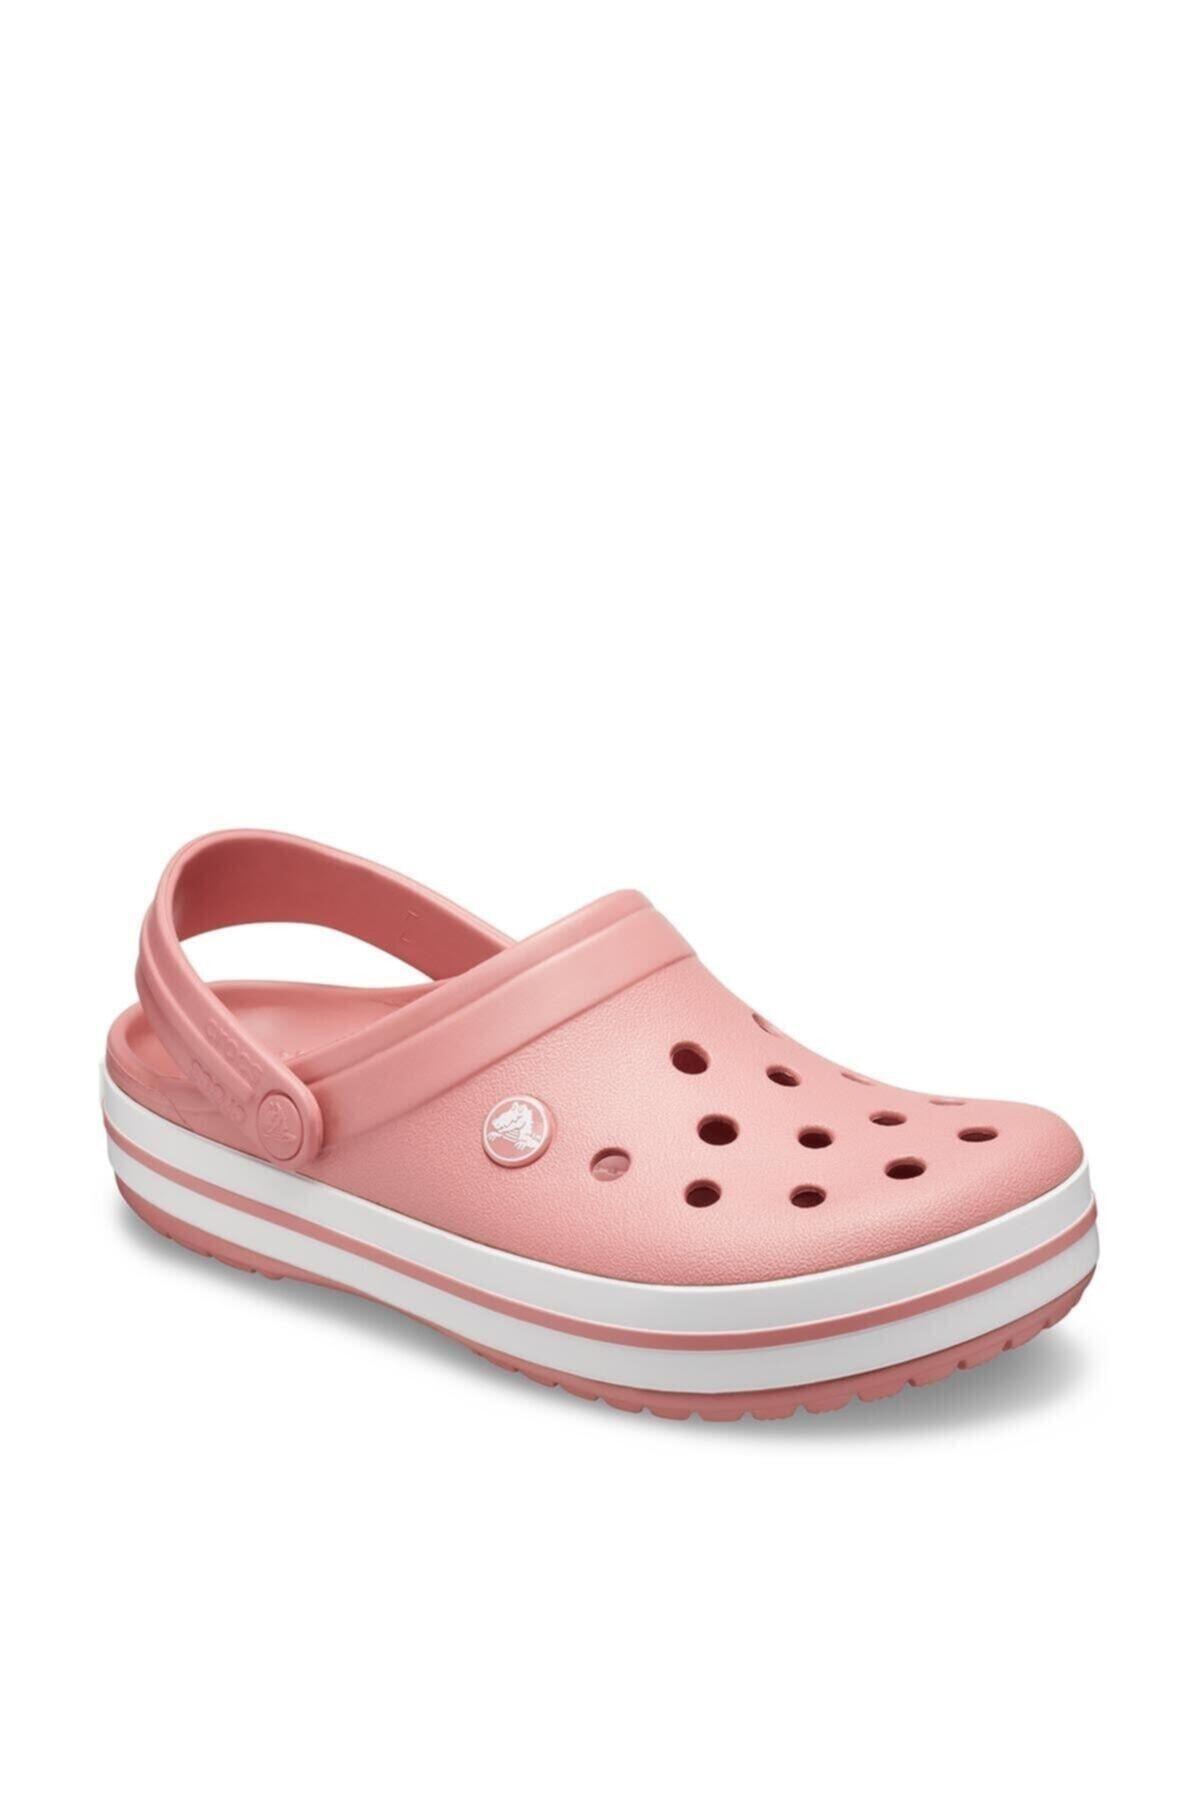 Crocs 11016-6MB Crocband Terlik 1